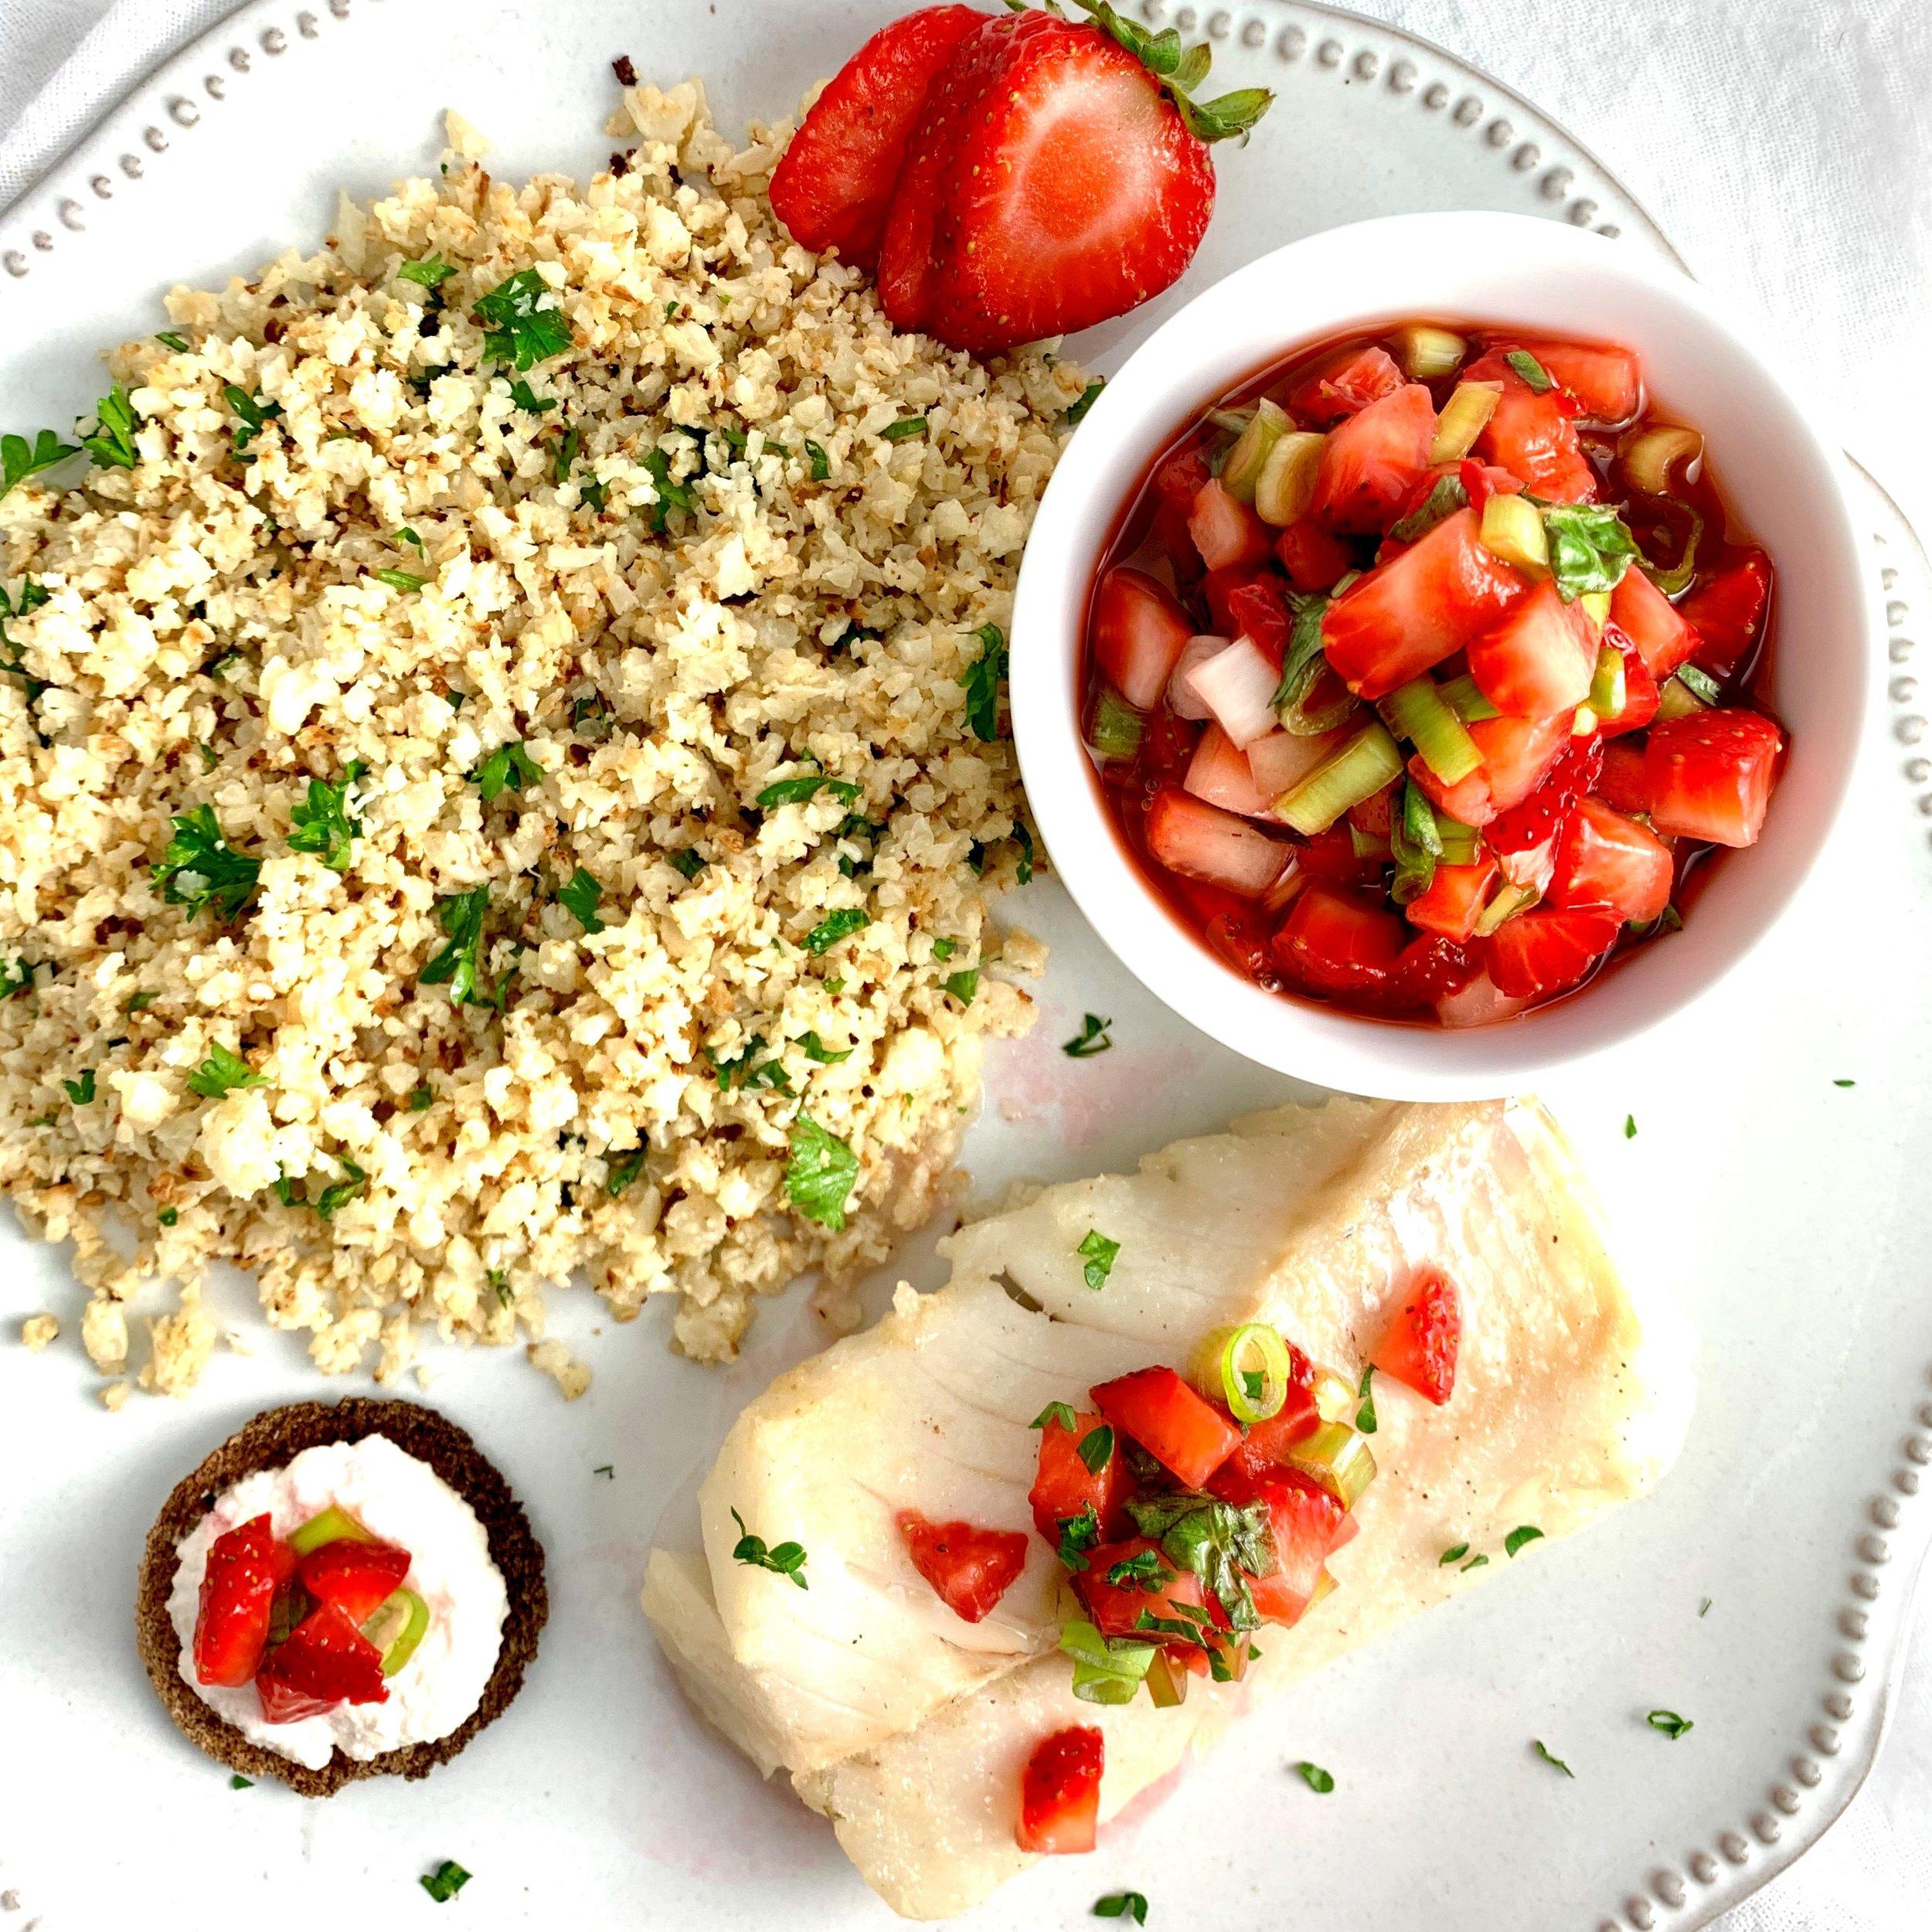 Strawberry basil relish.jpg